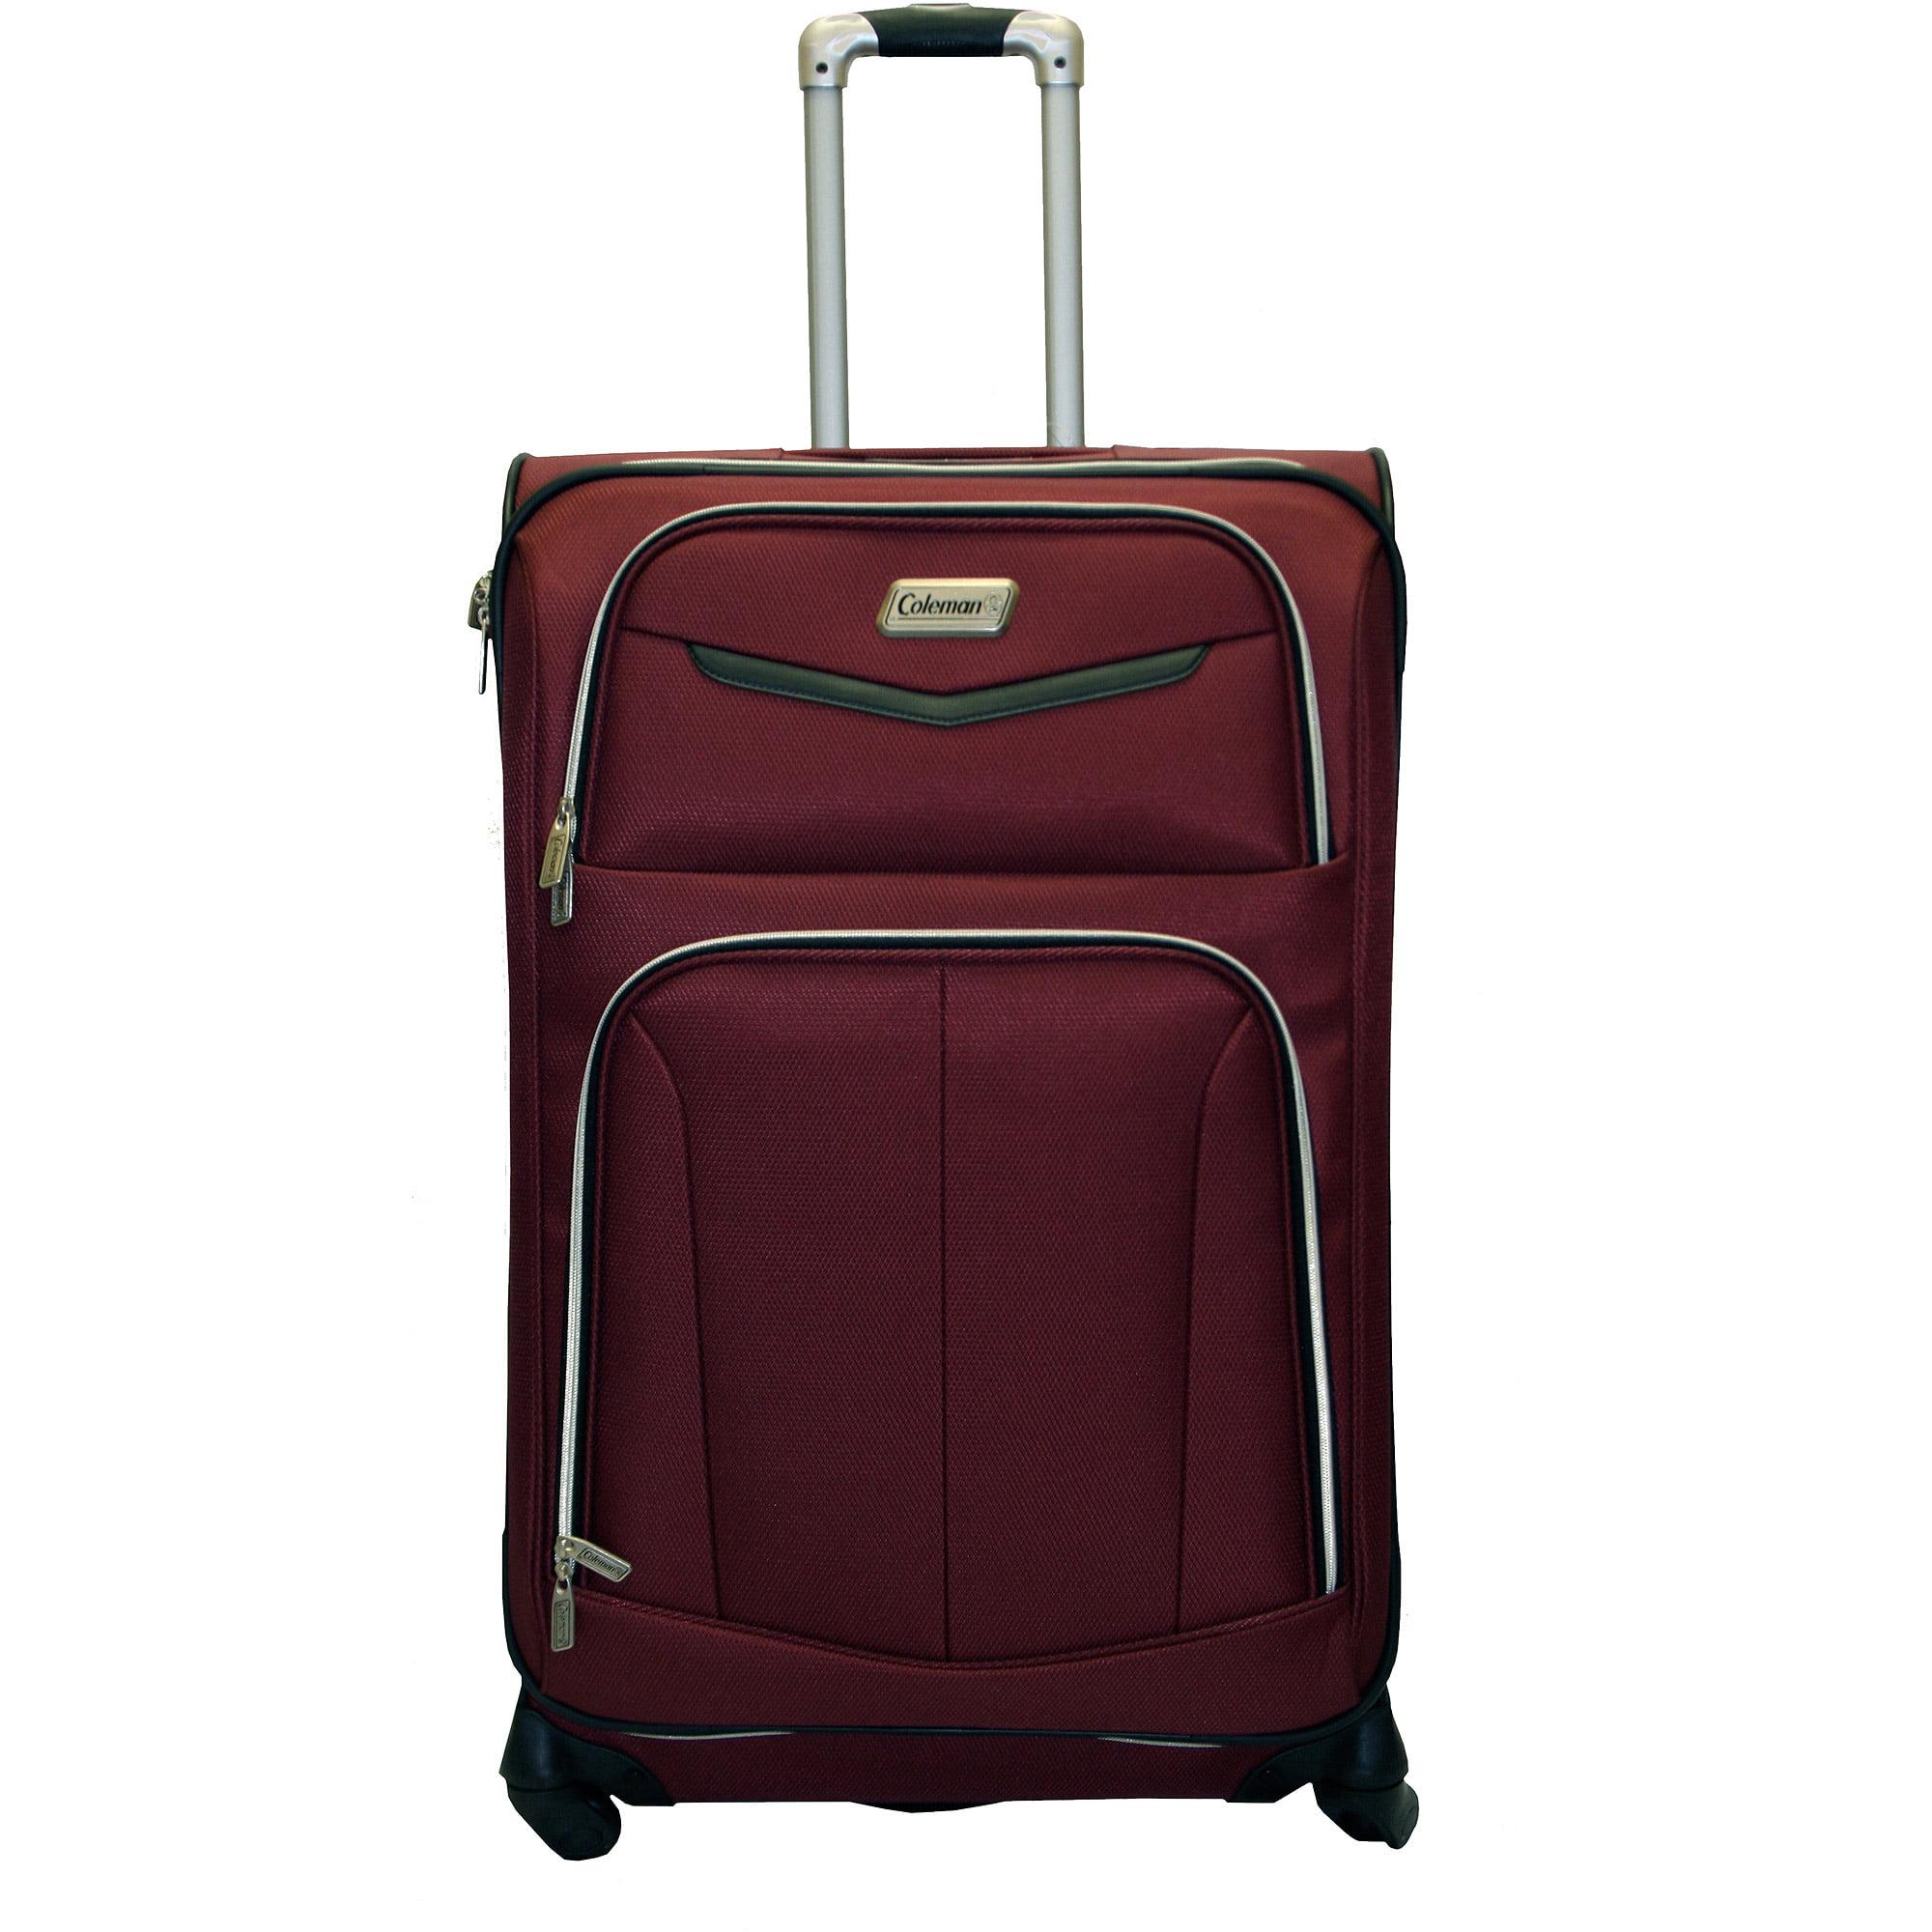 Coleman Gateway Upright Luggage